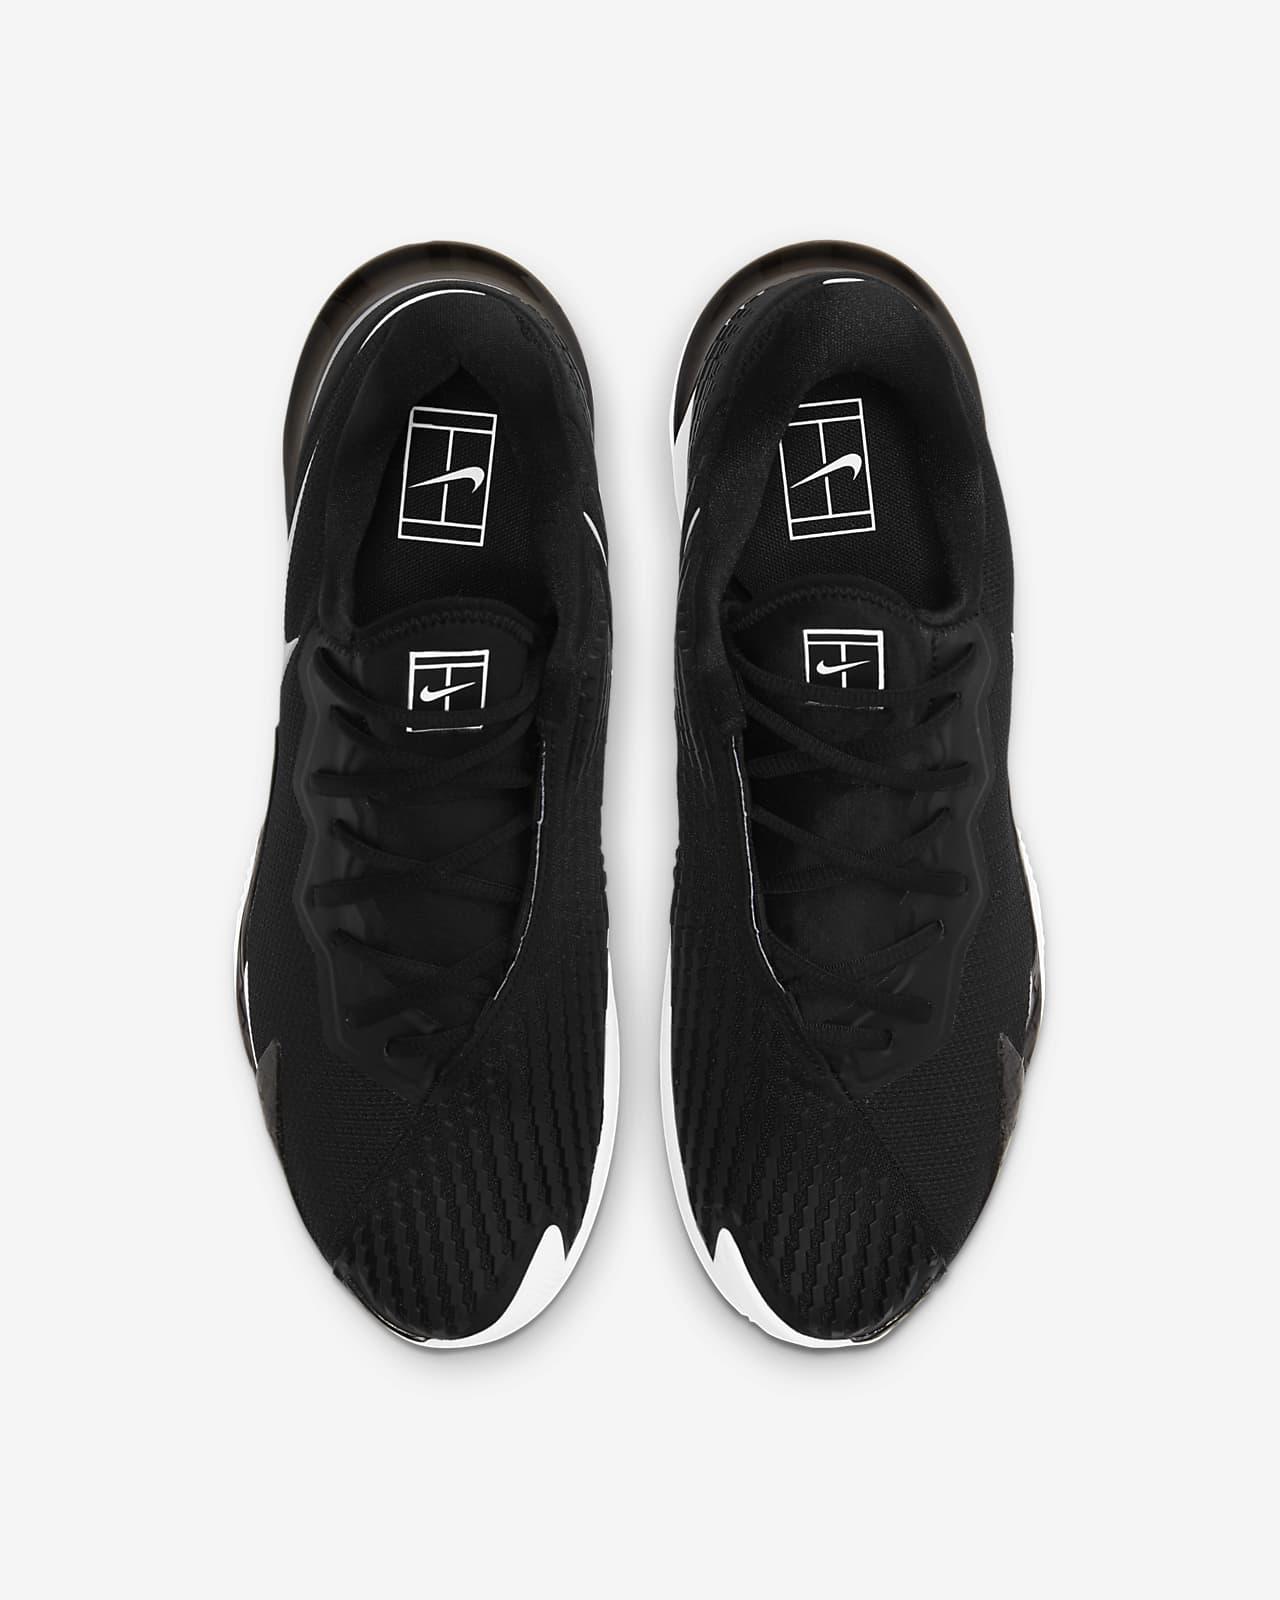 NikeCourt Air Zoom Vapor Cage 4 Men's Clay Tennis Shoe